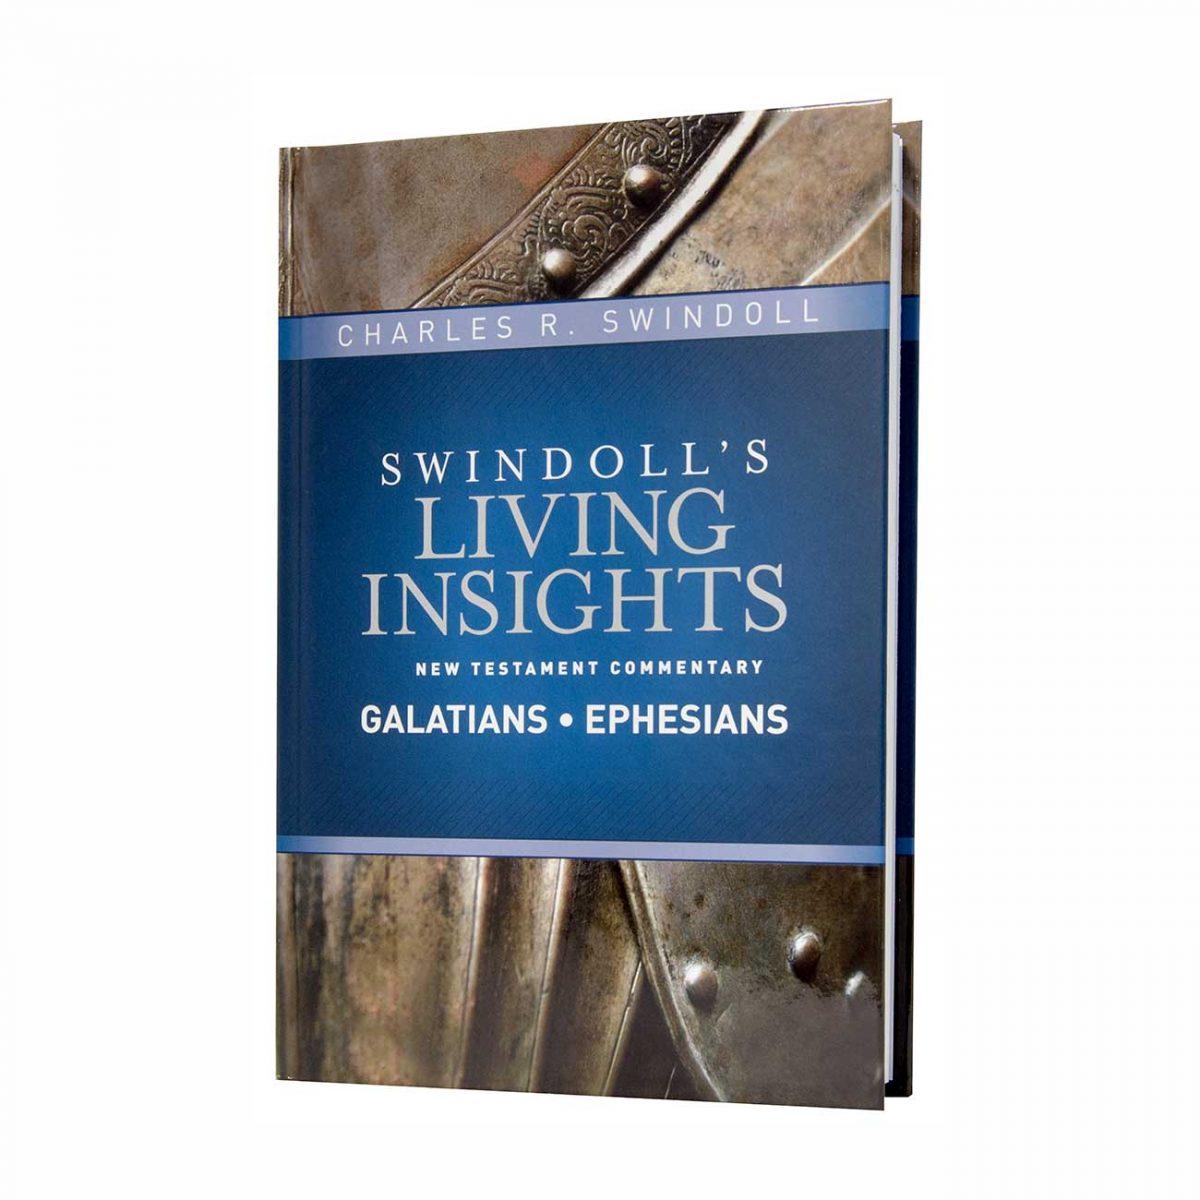 SWINDOLL'S LIVING INSIGHTS NEW TESTAMENT COMMENTARY: GALATIANS AND EPHESIANS, hardback book